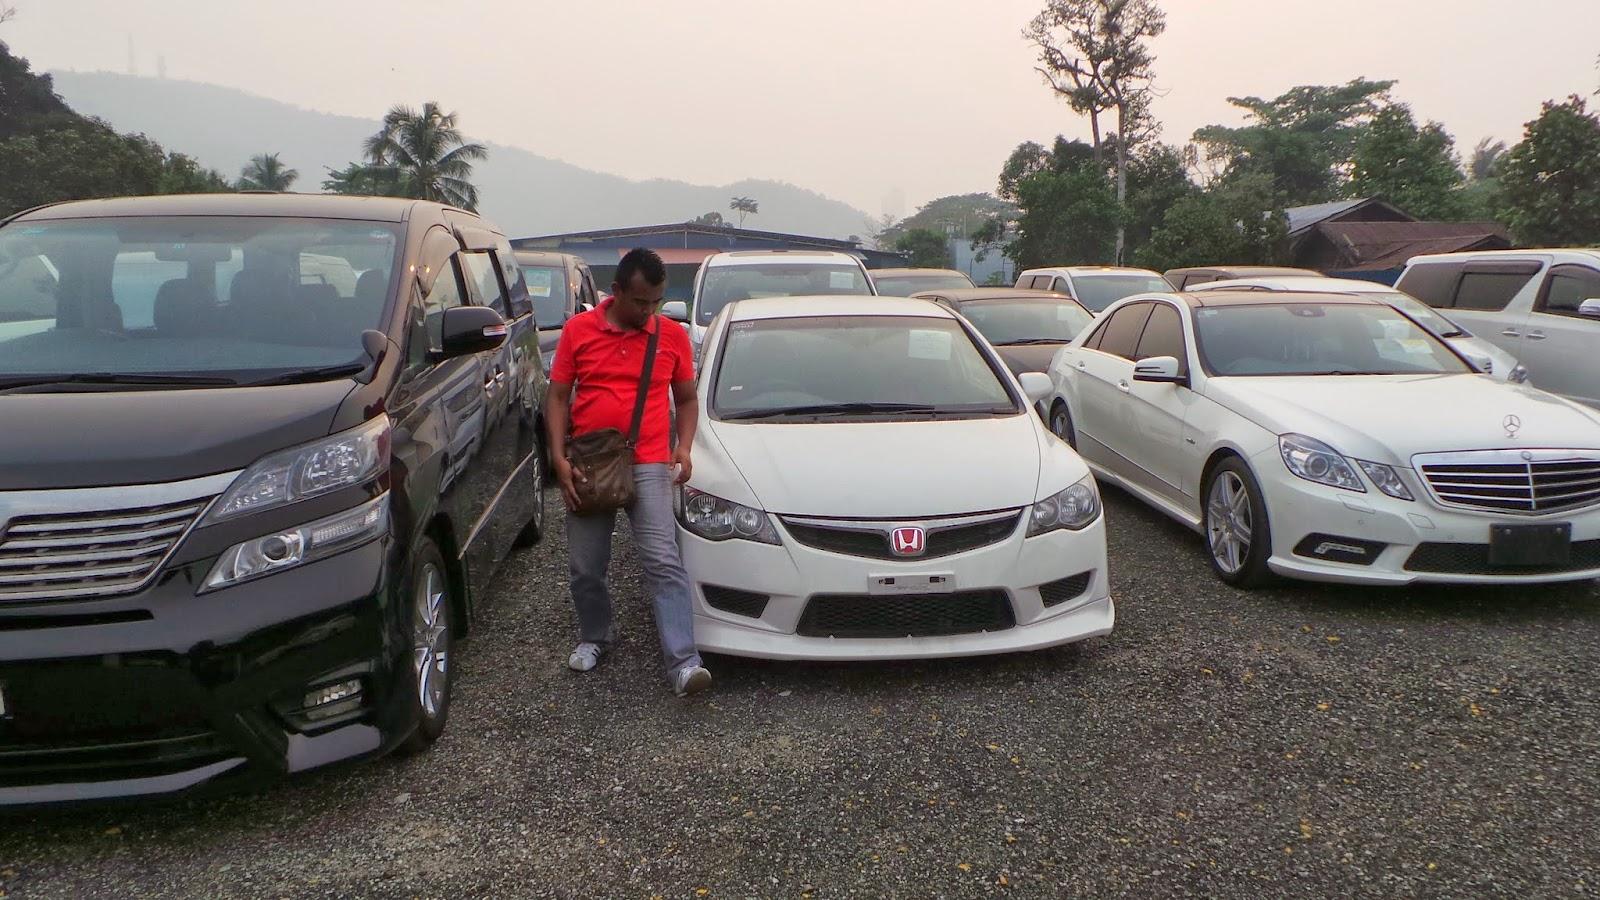 Mudah Honda Civic Upcoming Cars In Malaysia Mudah My